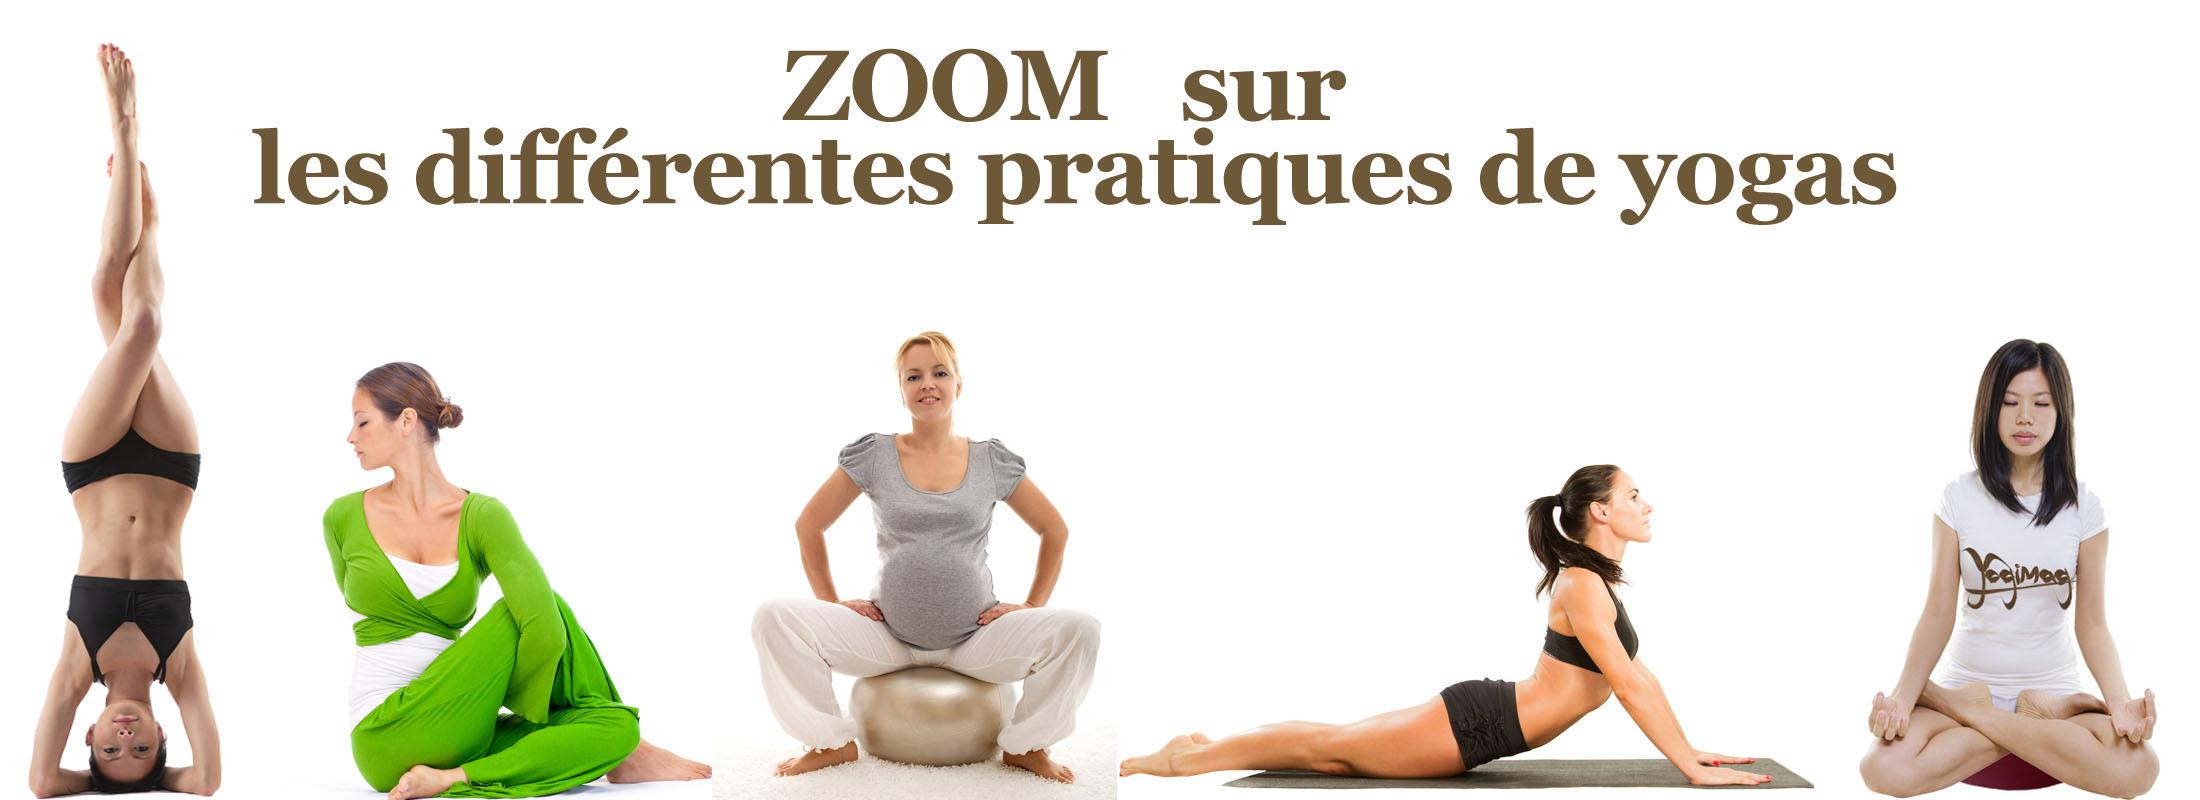 yogimag- disciplines pratiques yogas